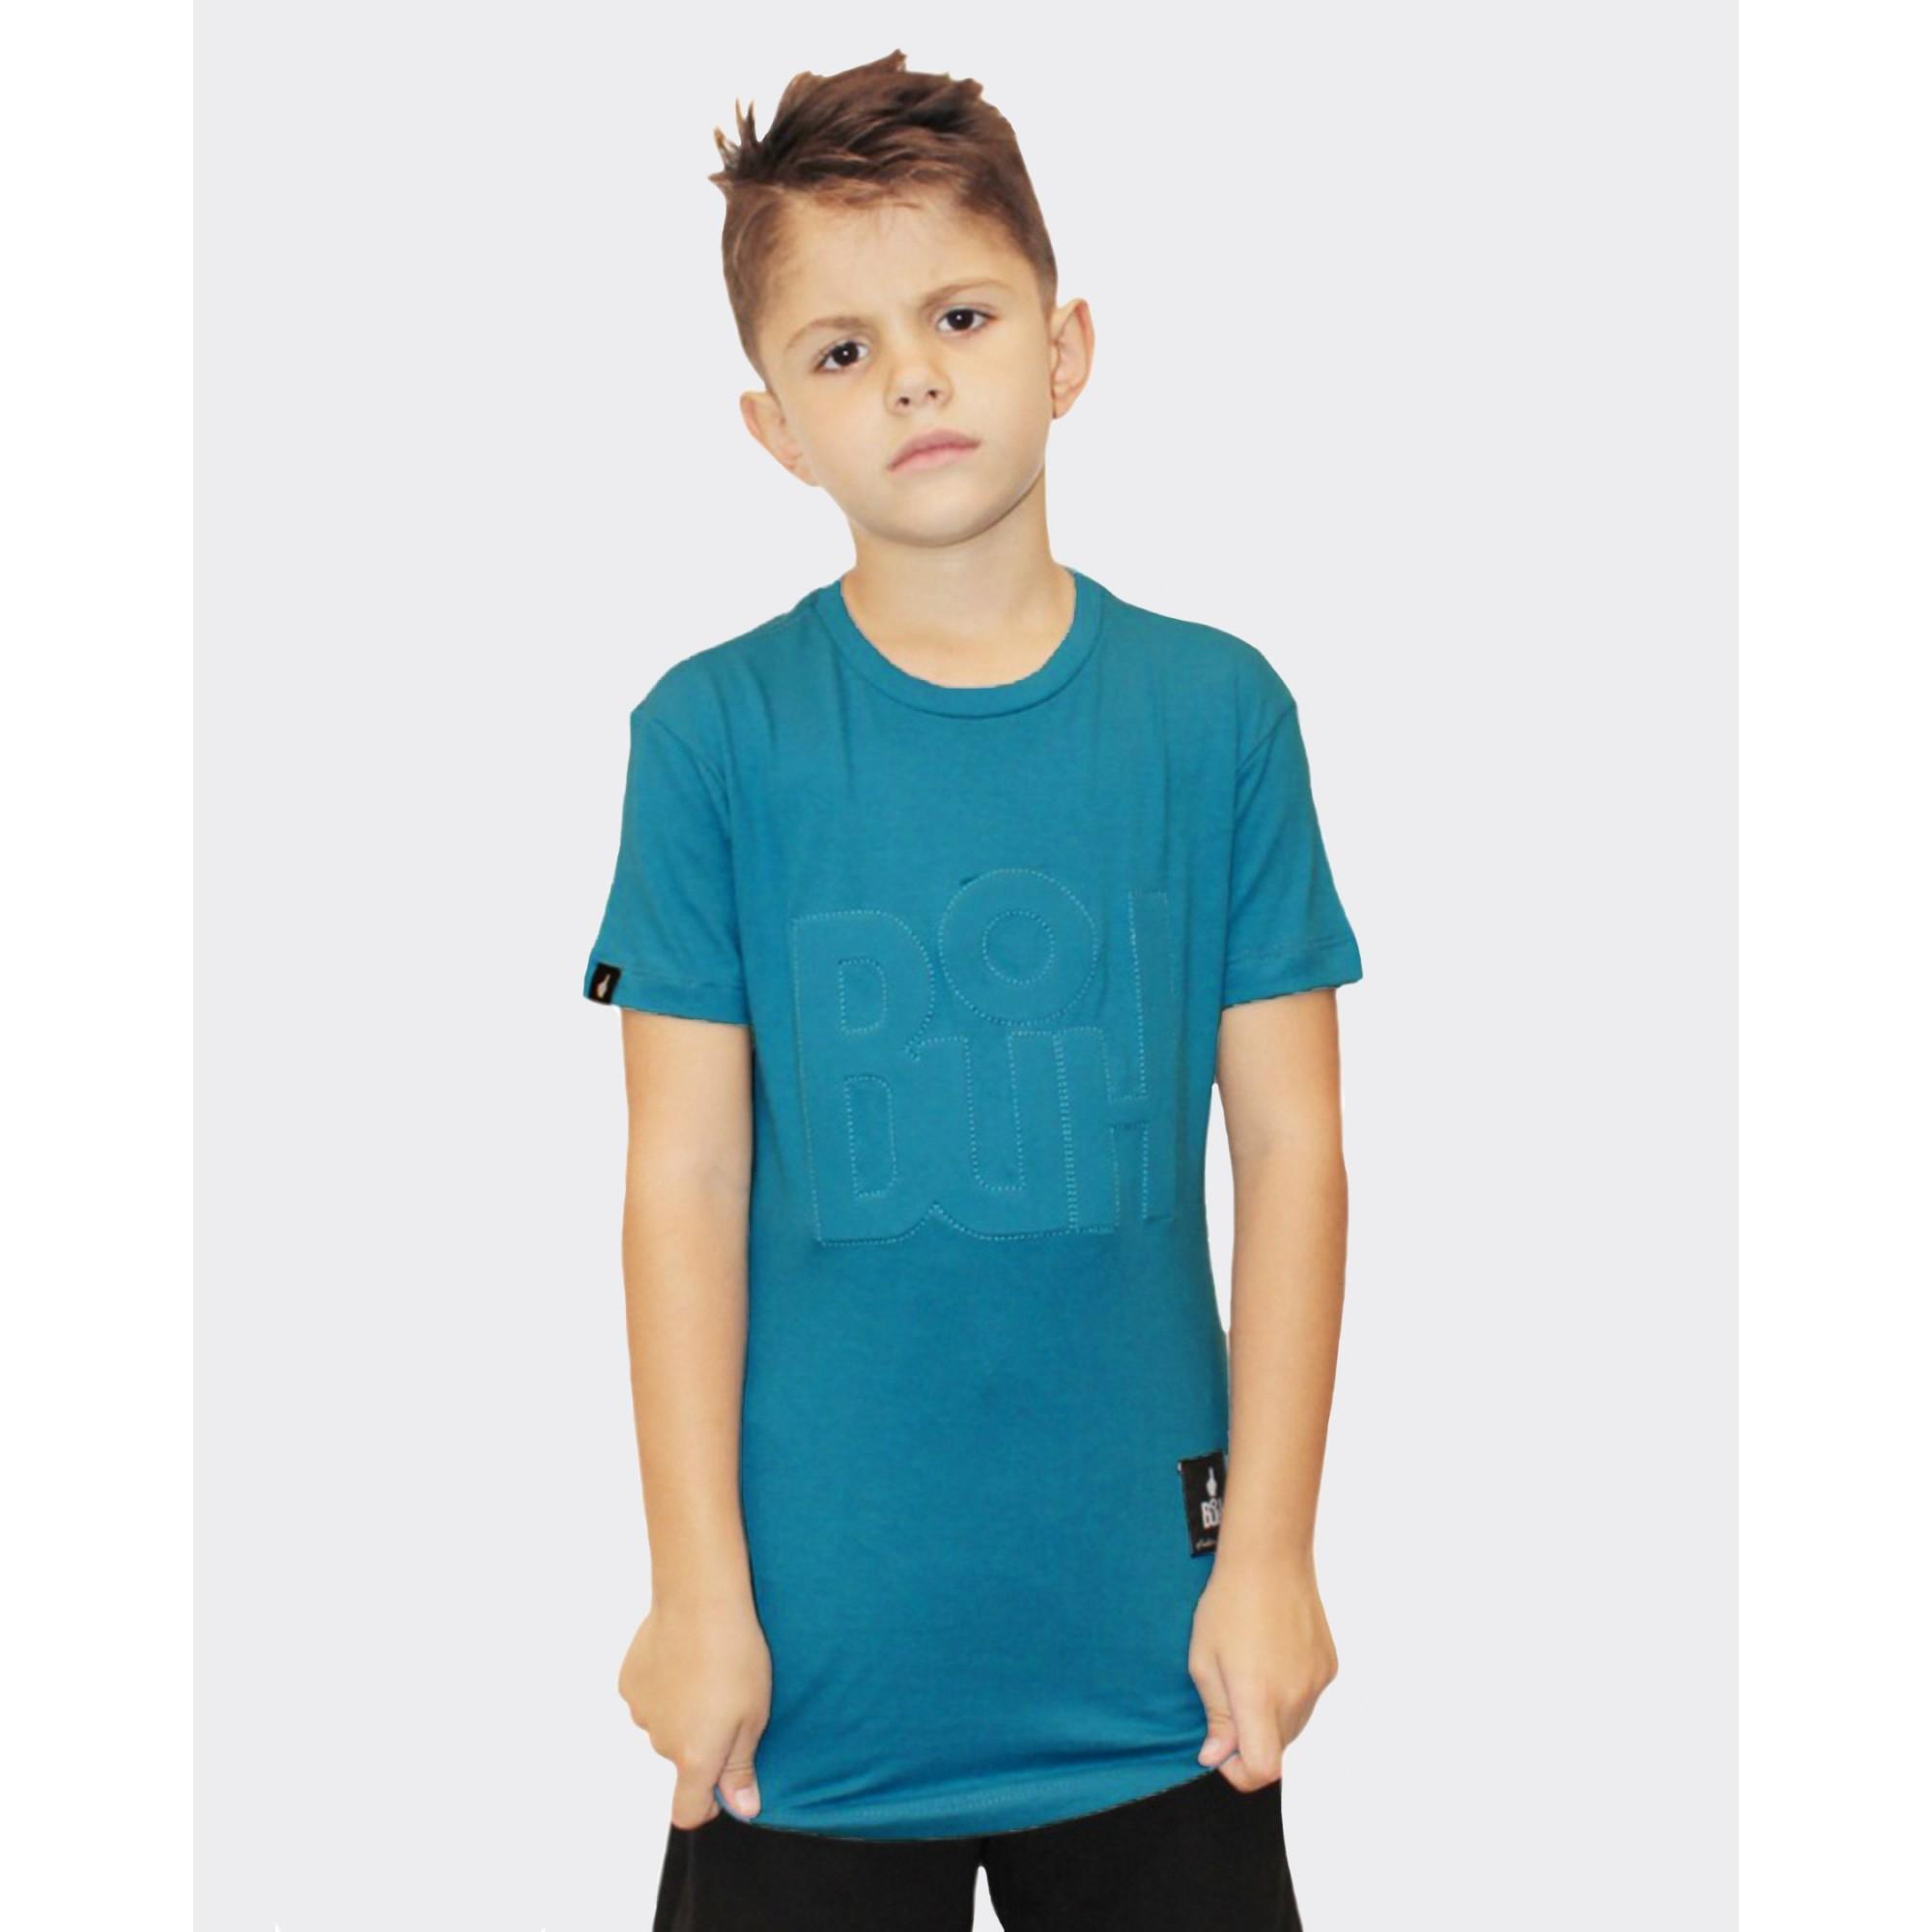 Camiseta Buh Kids Relevo Blue